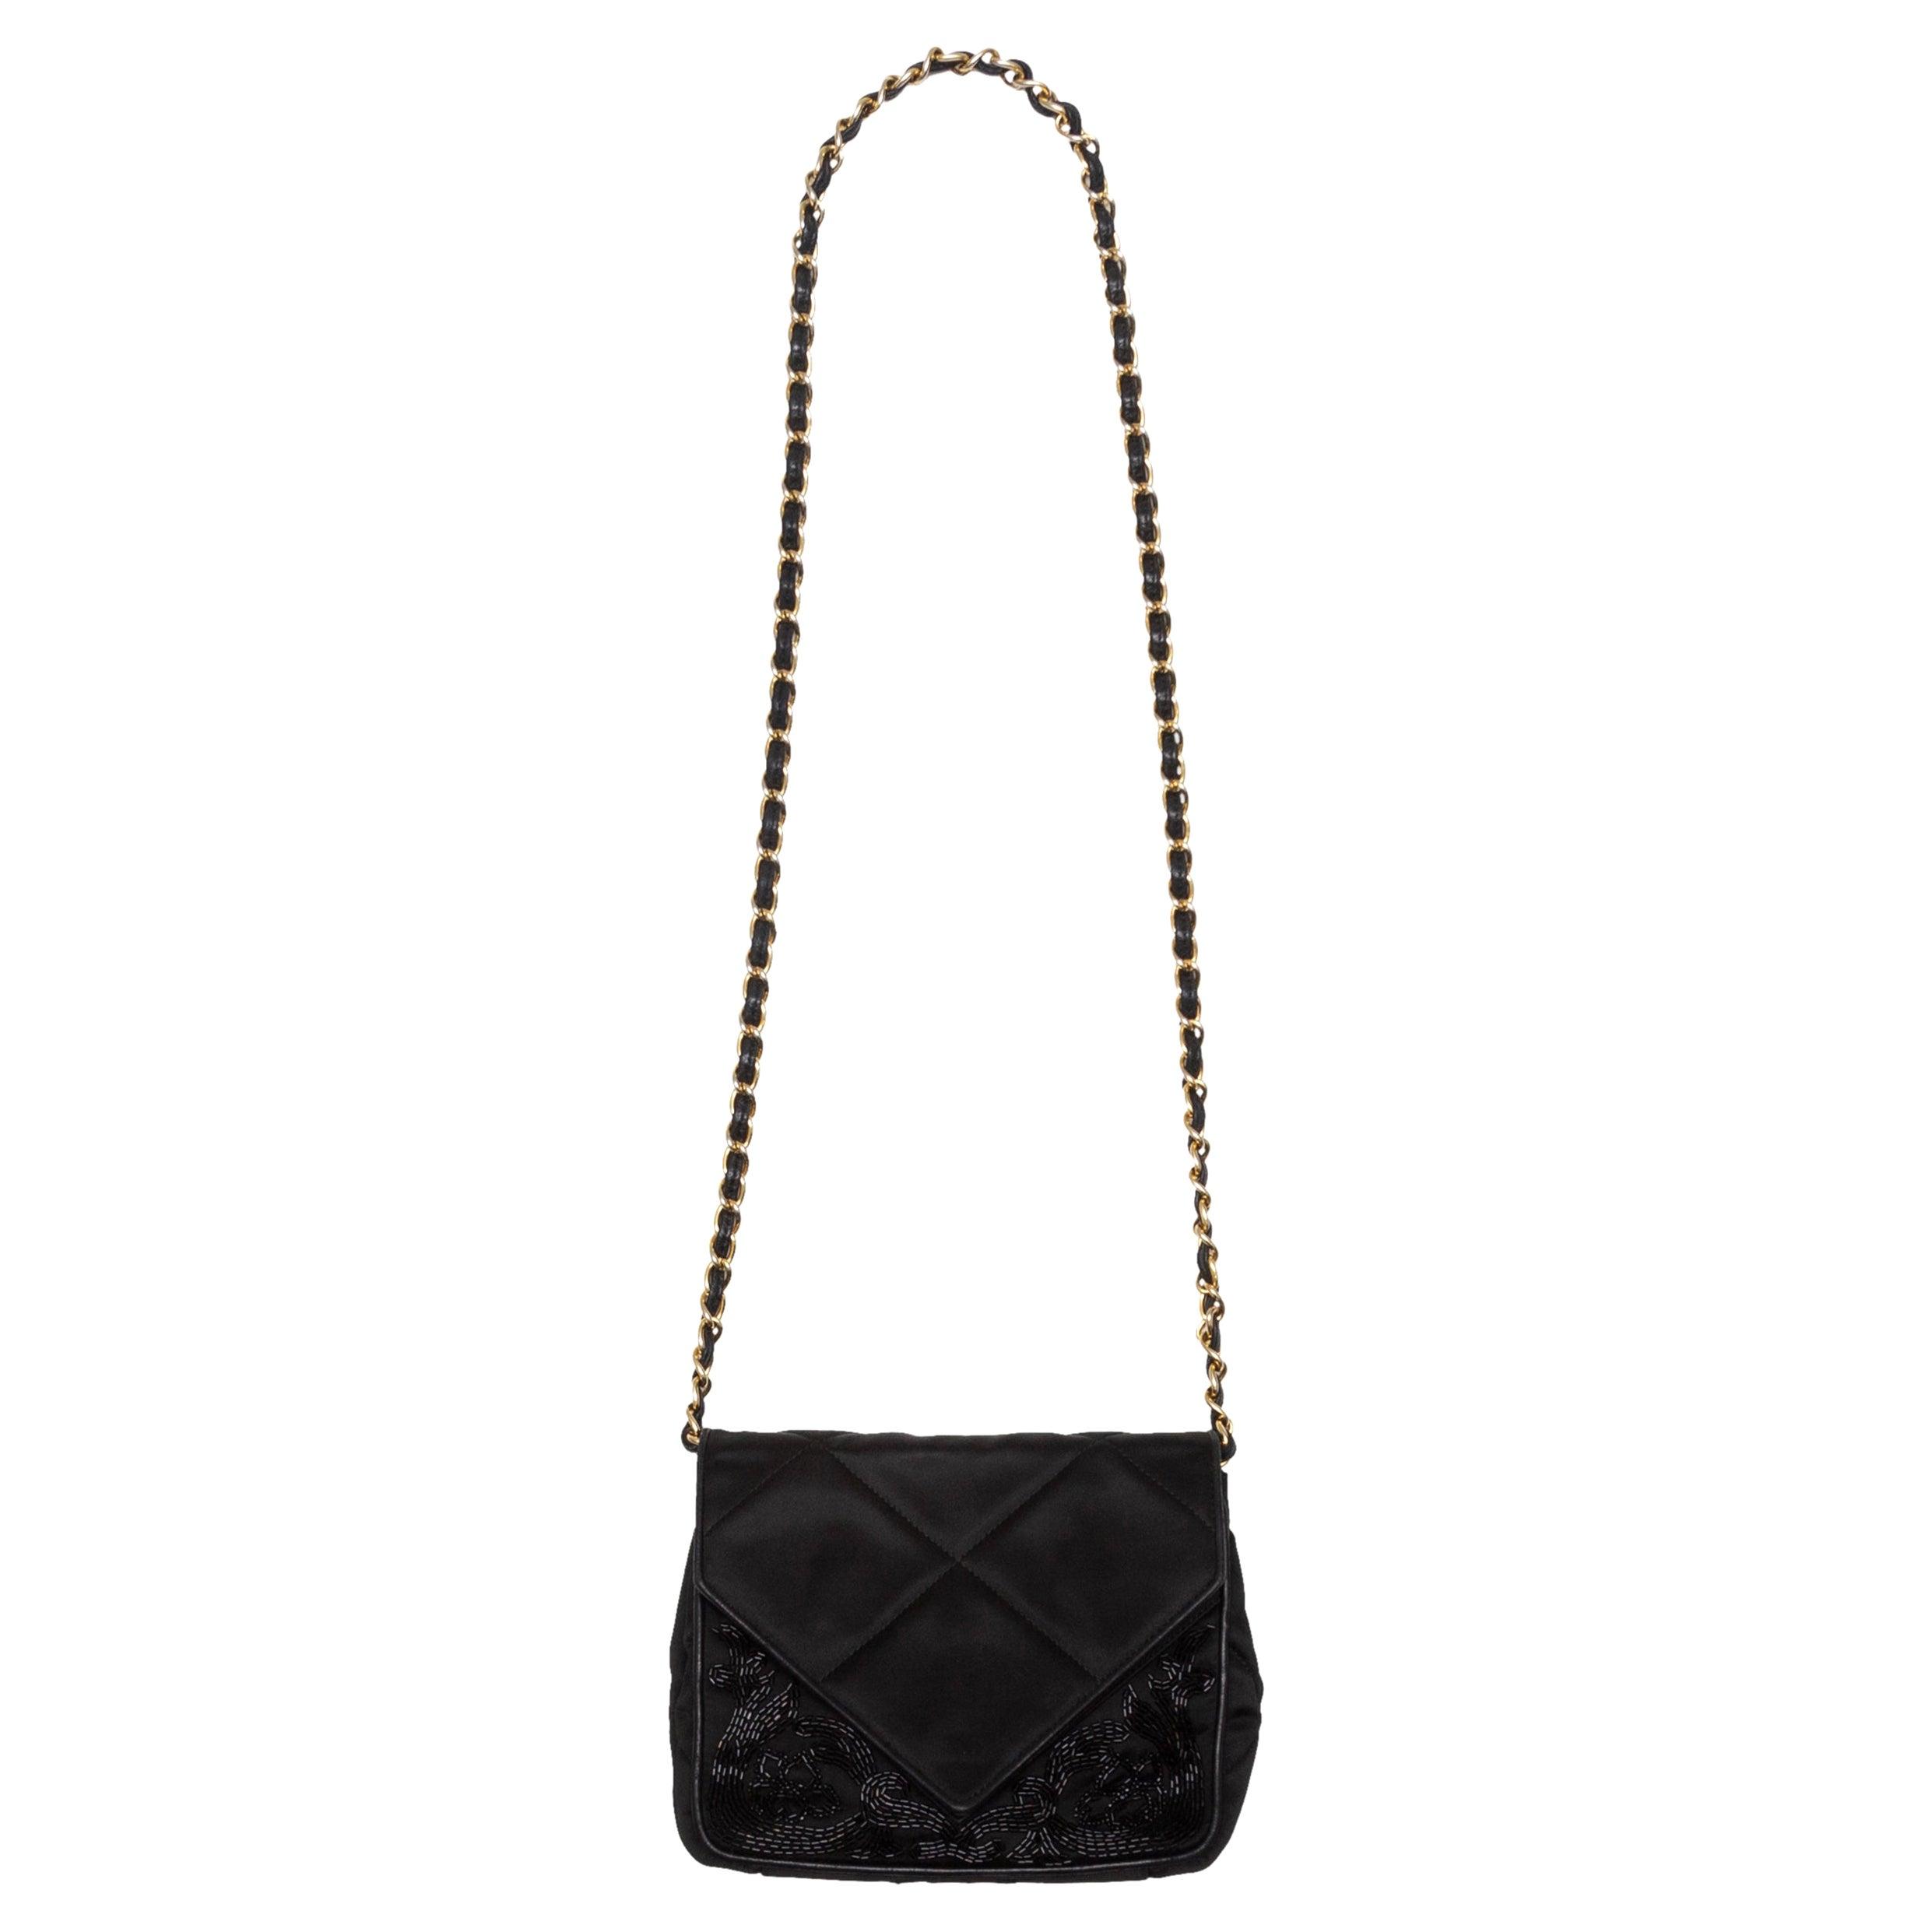 Chanel Black Beaded Satin Evening Bag